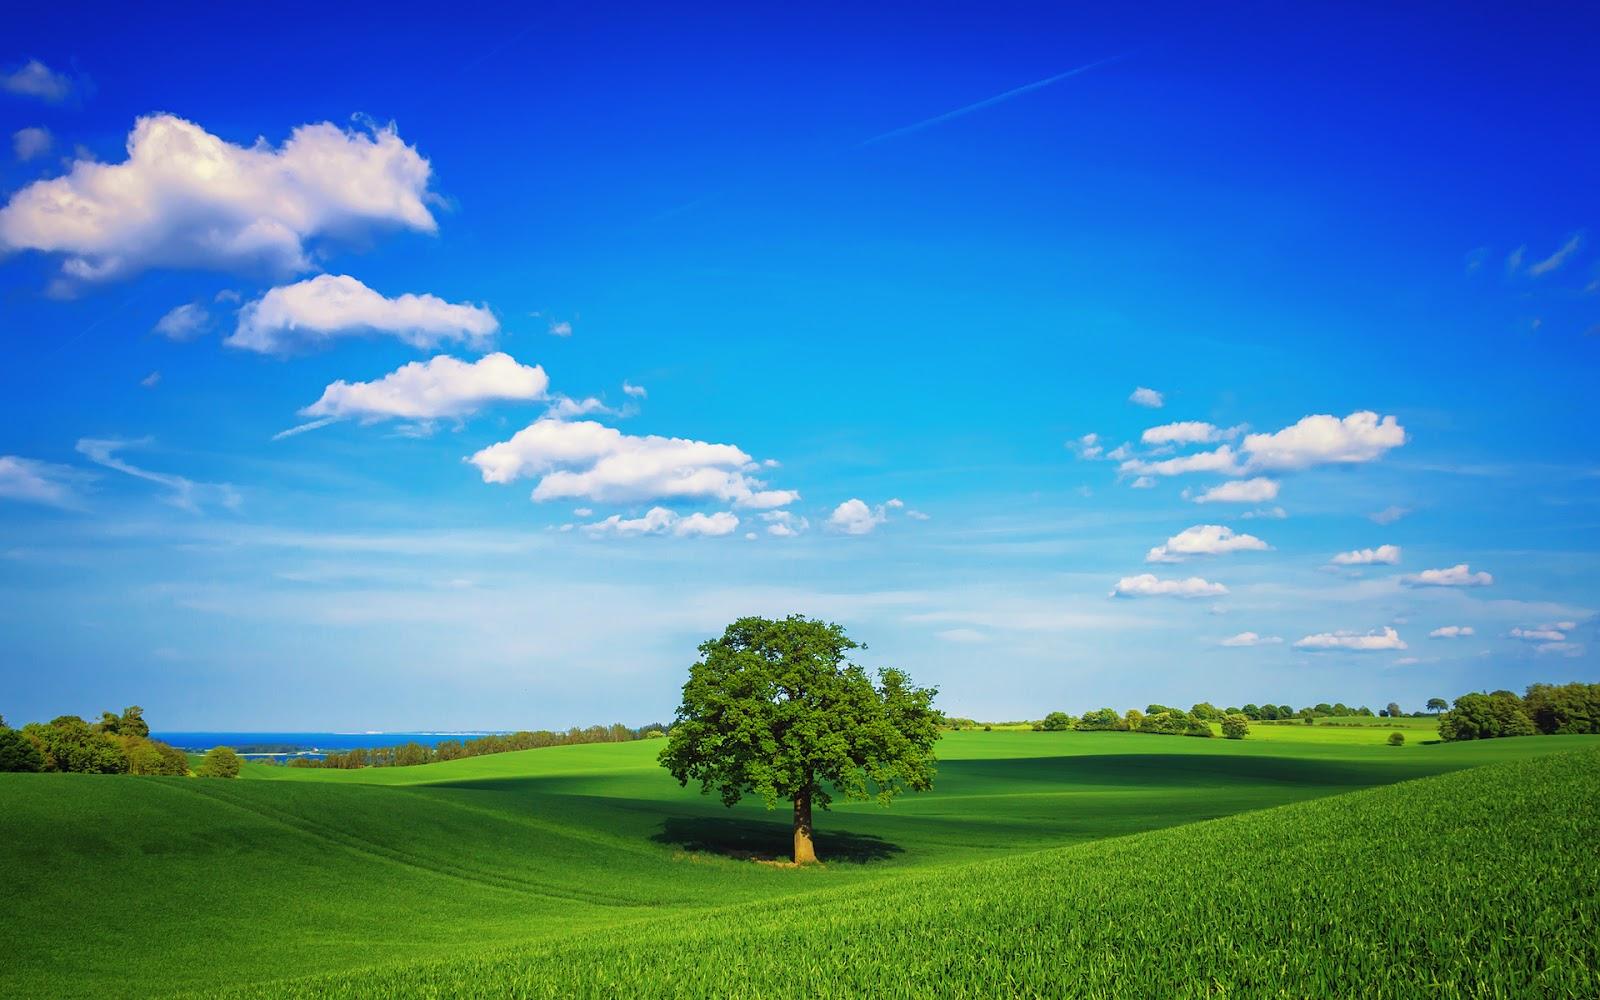 Hd wallpaper paisajes free download wallpaper dawallpaperz for Fondo de pantalla primavera